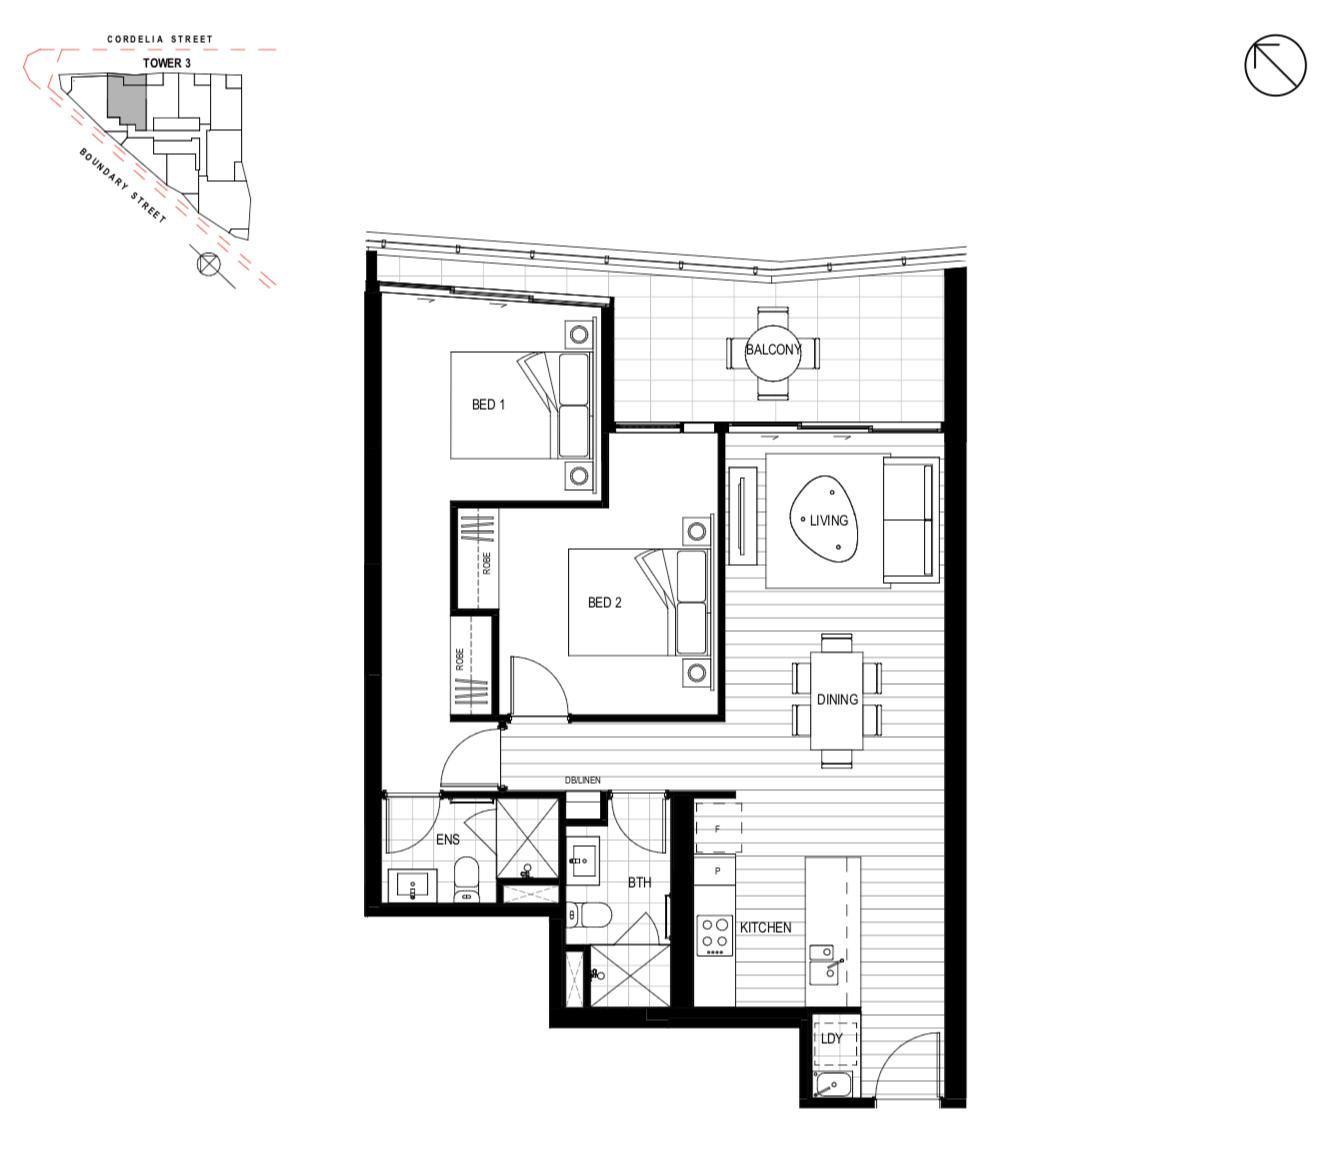 Tower 3 Unit 0403 - 2 Bedroom